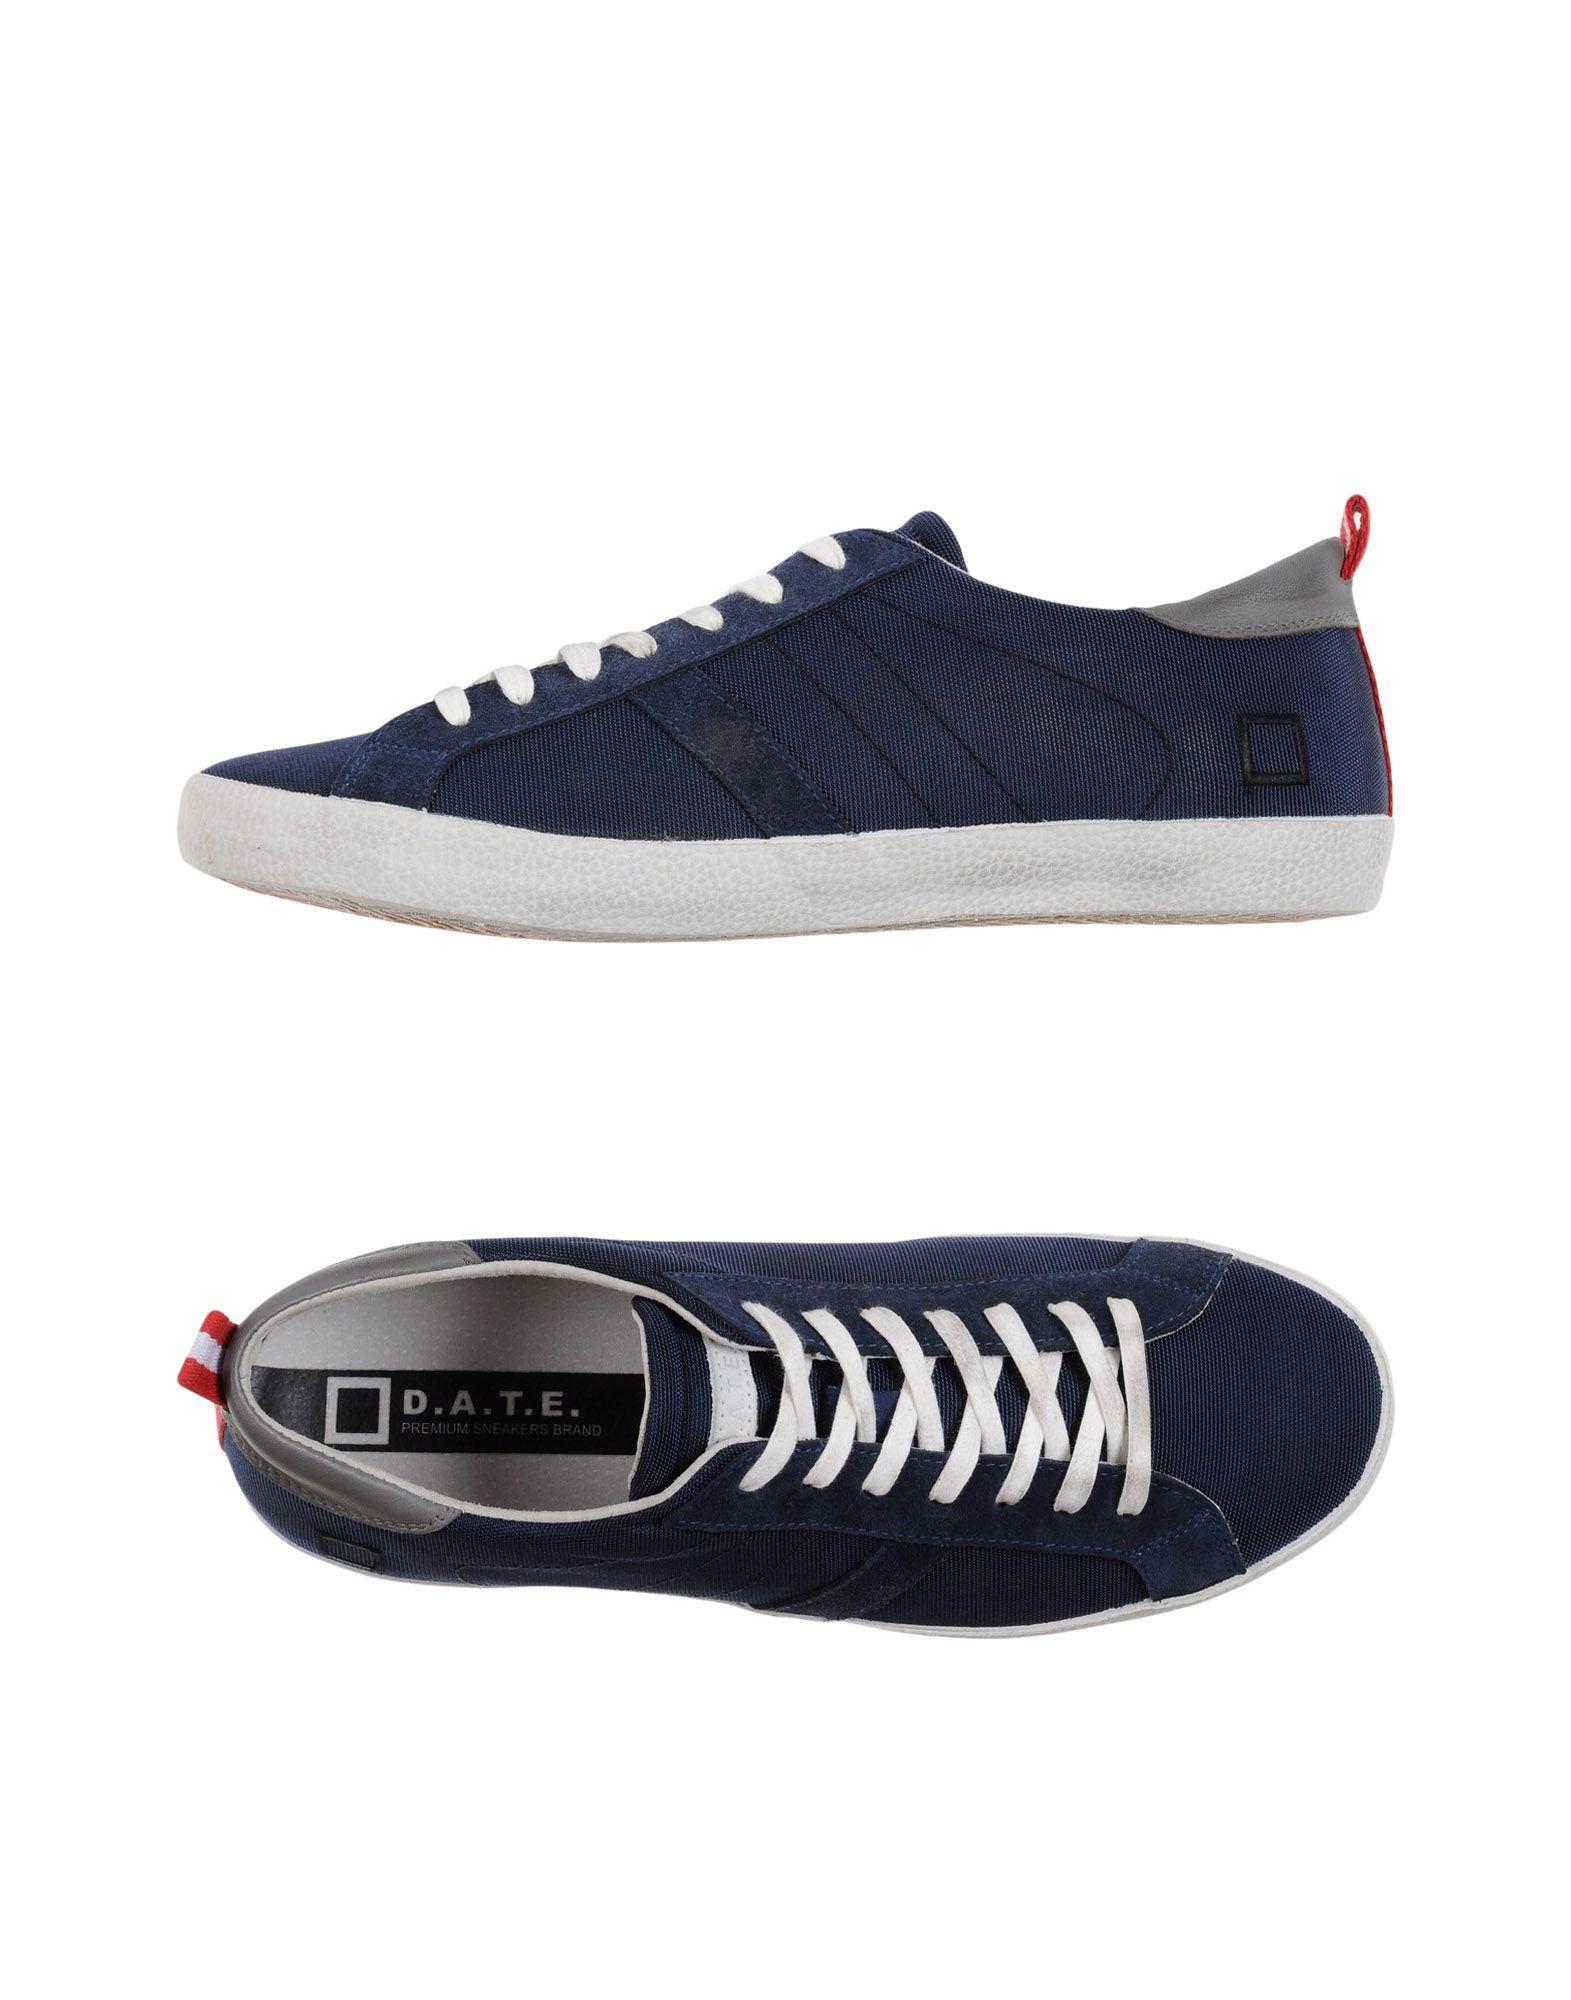 D.A.T.E. Sneakers Herren Herren Sneakers  11157702UF ef7da1